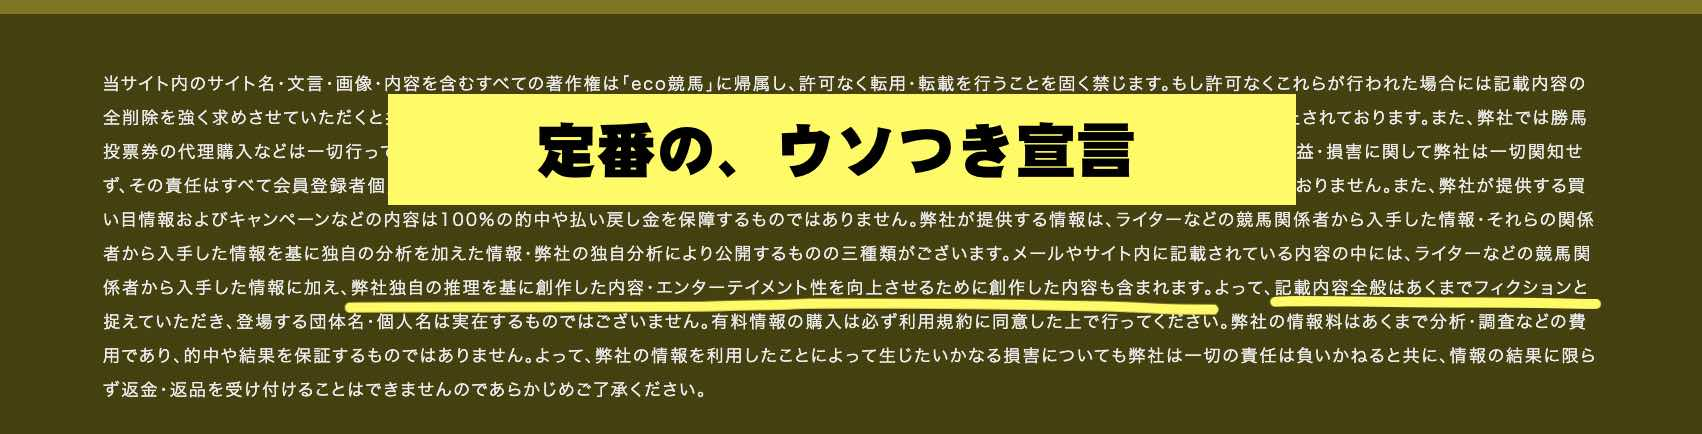 eco競馬(エコ競馬)という競馬予想サイトのウソつき宣言